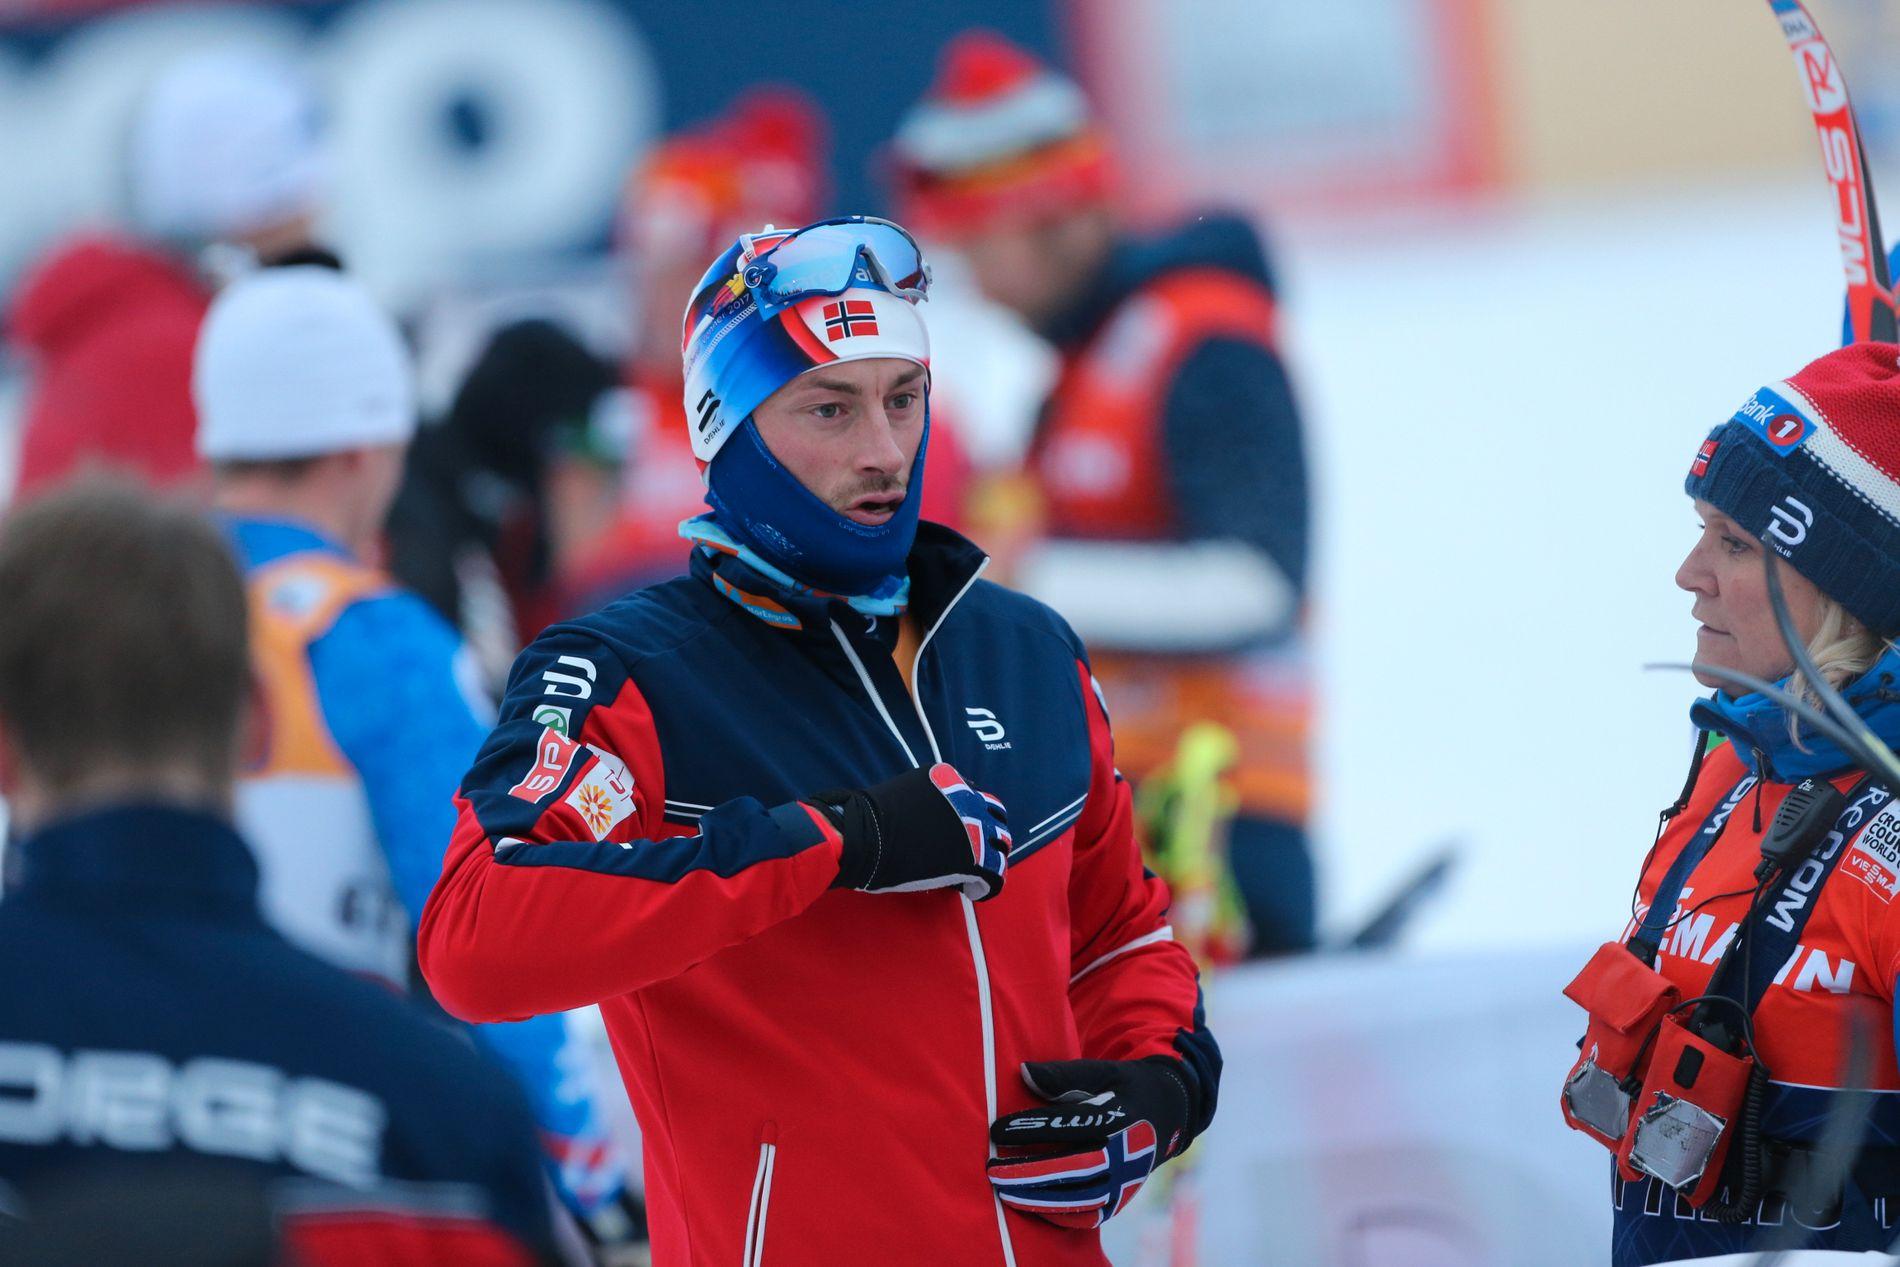 UTSLÅTT: Petter Northug, her fra sprintprologen på Lillehammer lørdag.